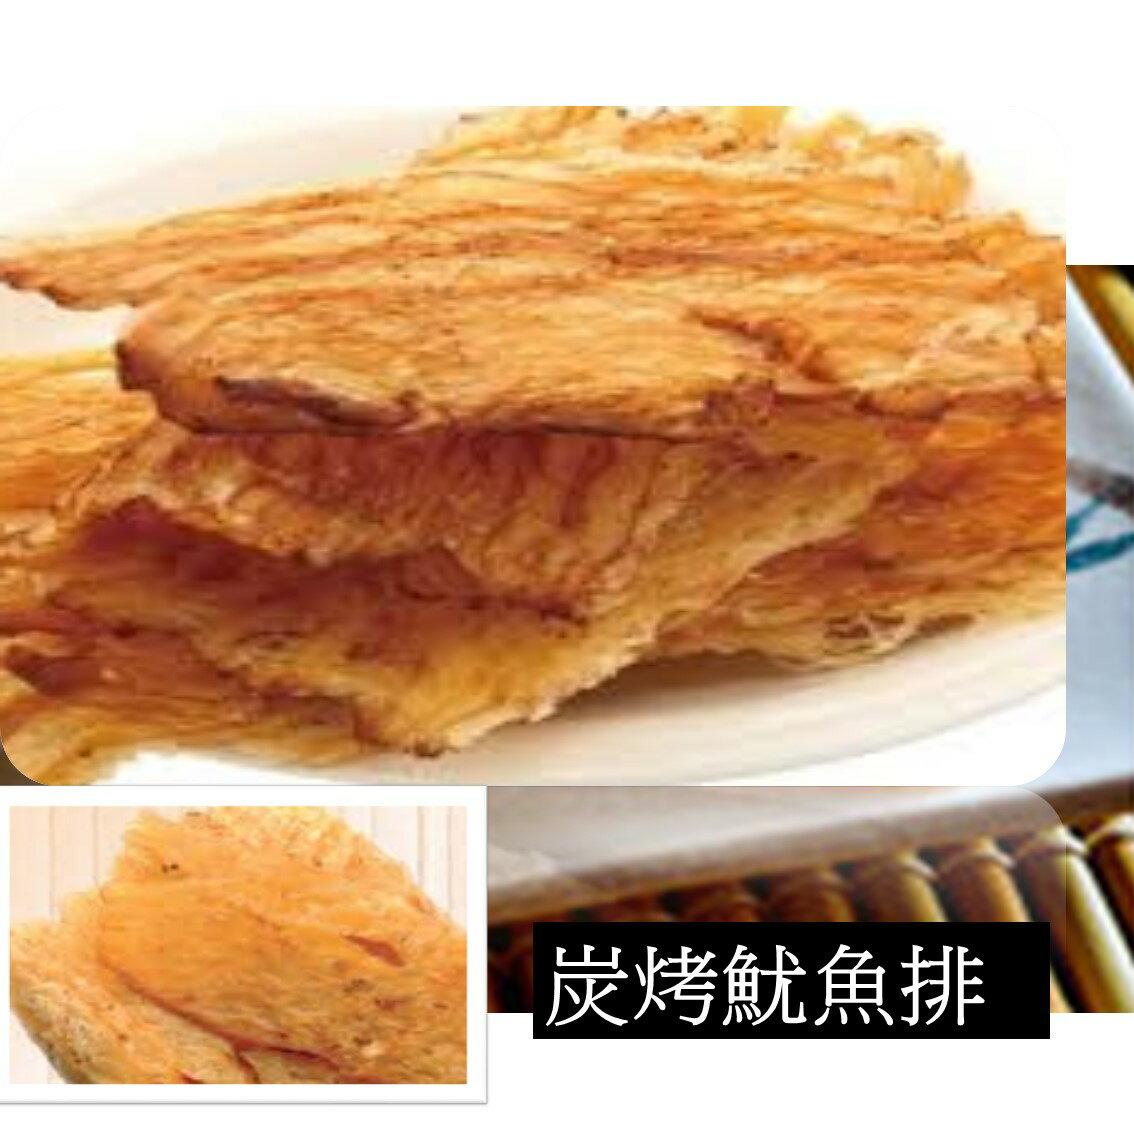 <br/><br/> 碳烤魷魚排片/蜜汁魷魚排片110g【樂活生活館】<br/><br/>